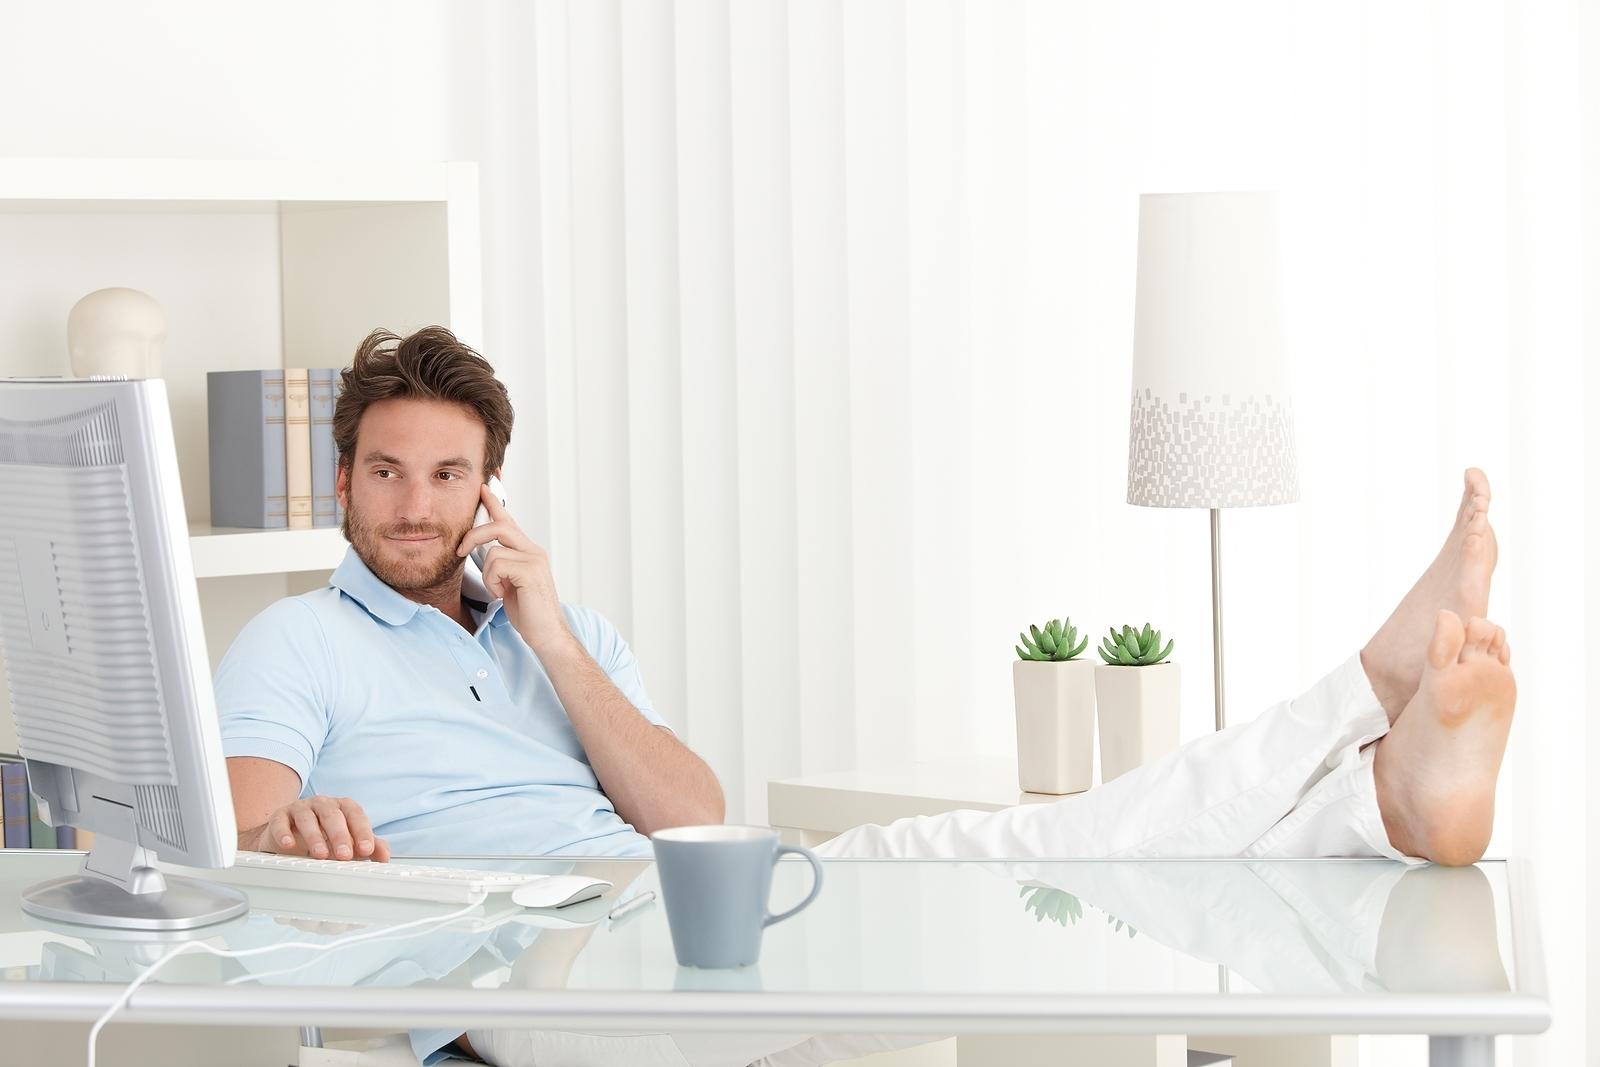 formula negócio online funciona alex vargas 3.0